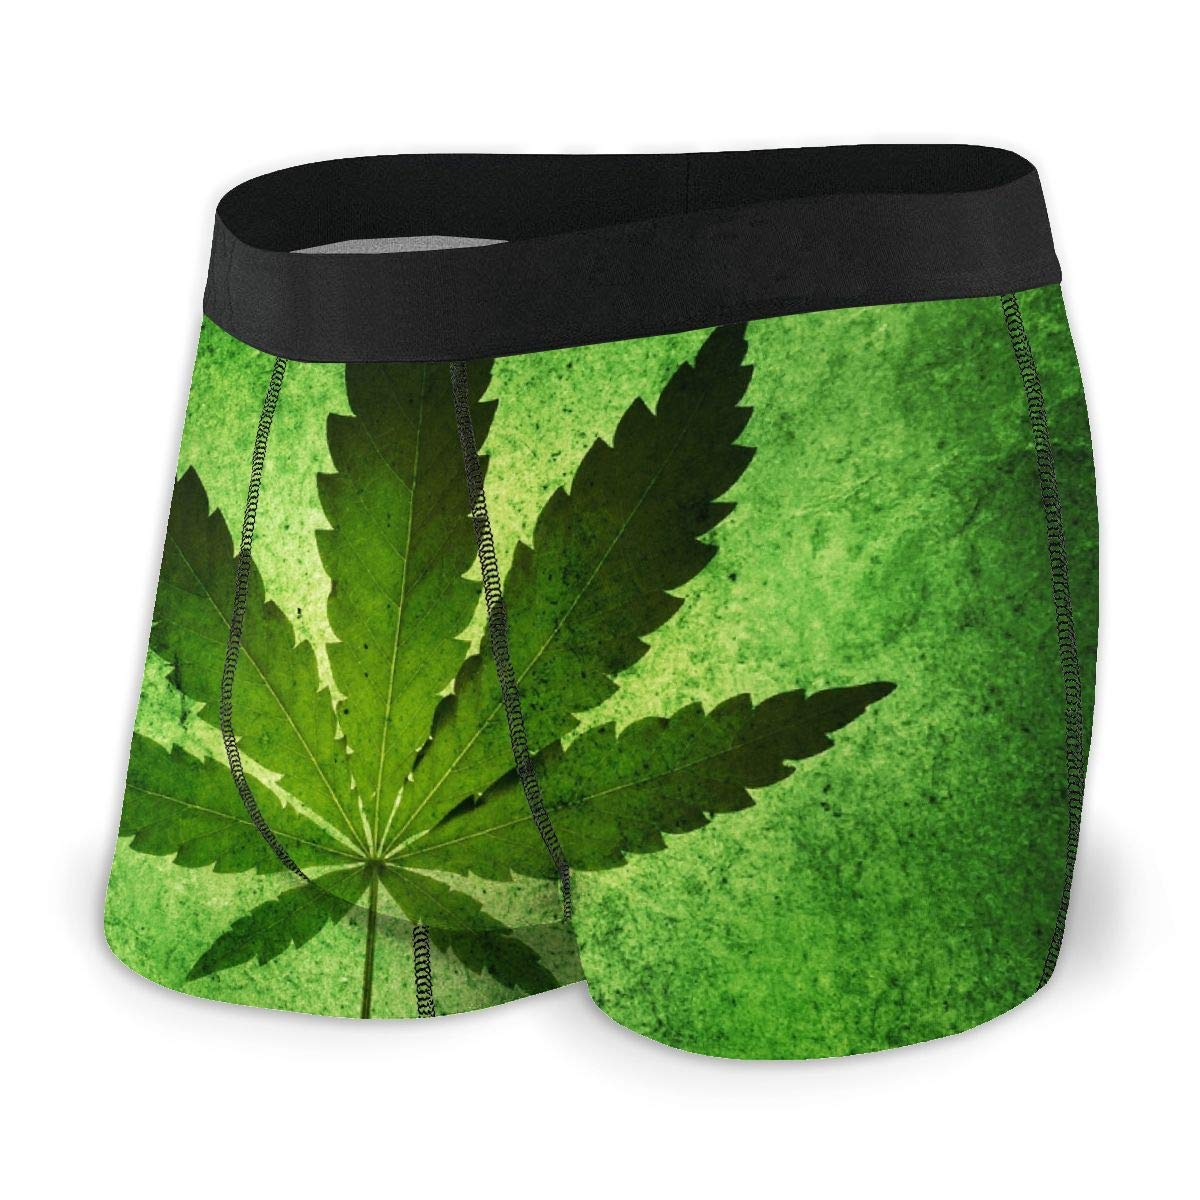 OJSFE Boxer Briefs Mens Underwear Pack Seamless Comfort SoftCannabis